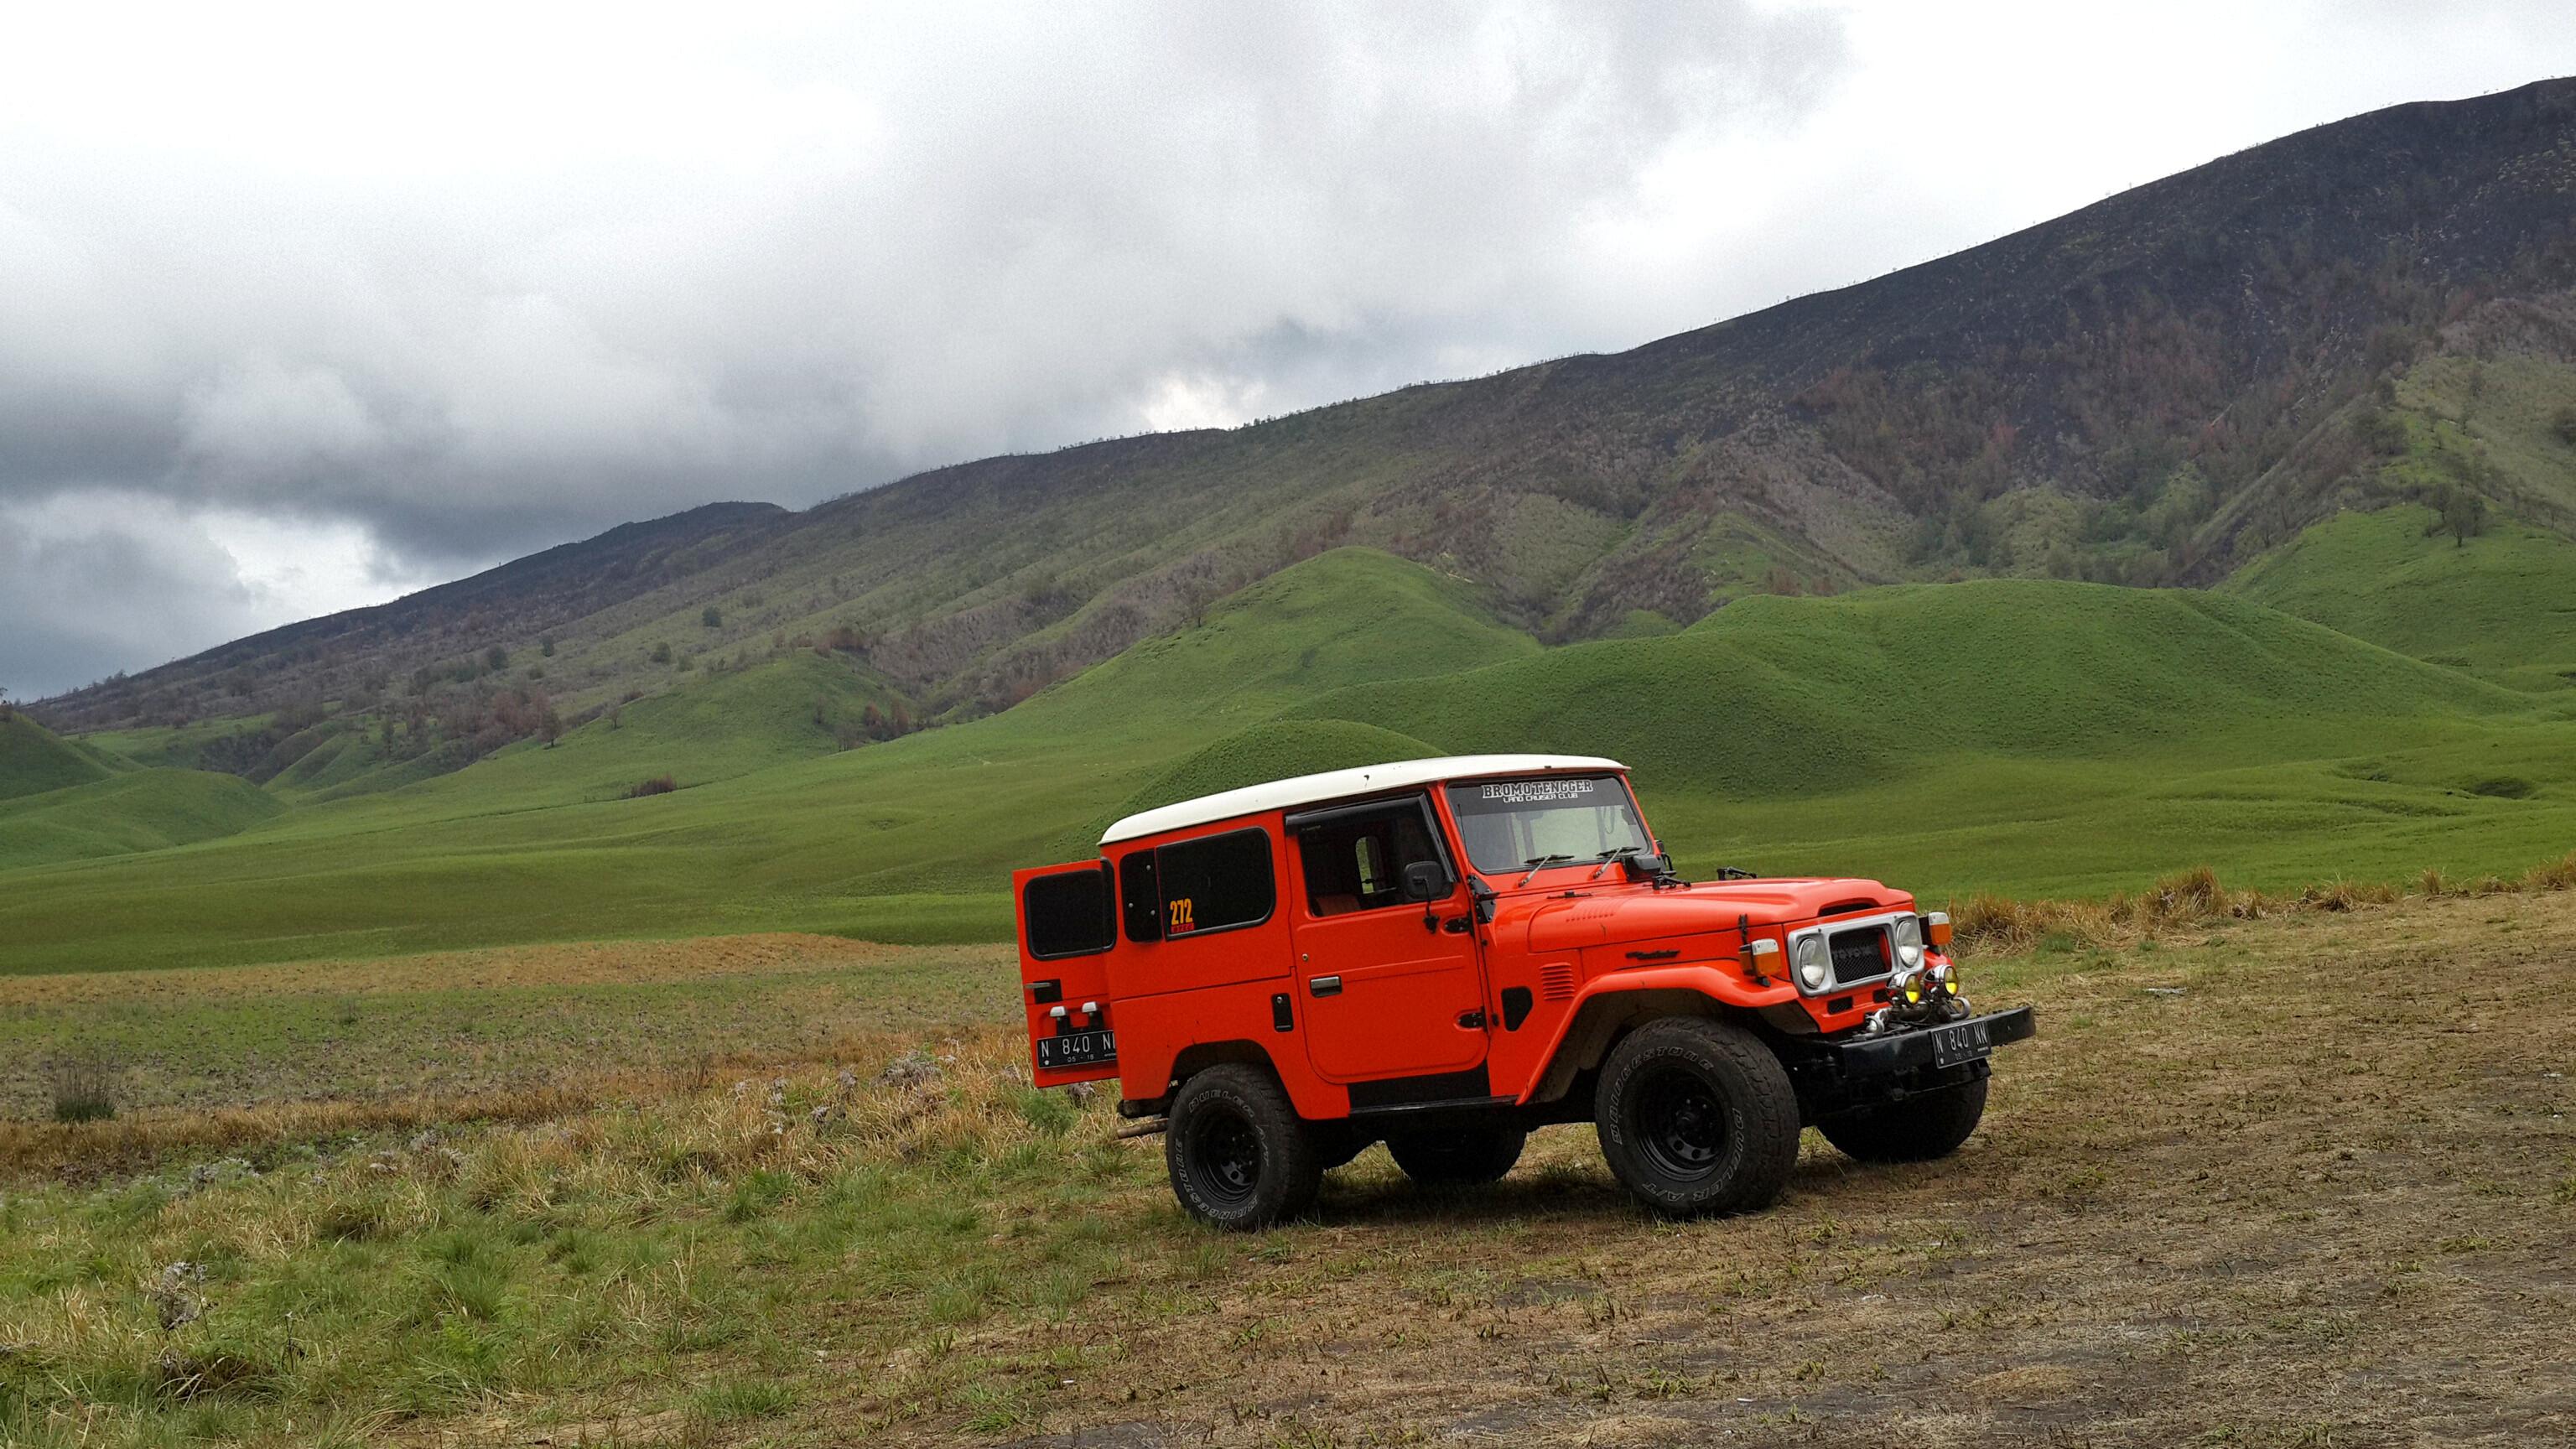 jeep bromo, jeep bromo harga, jeep bromo malang, http://rentalsewamobilmalangbatu.com/, Telkomsel 0821 41555 123